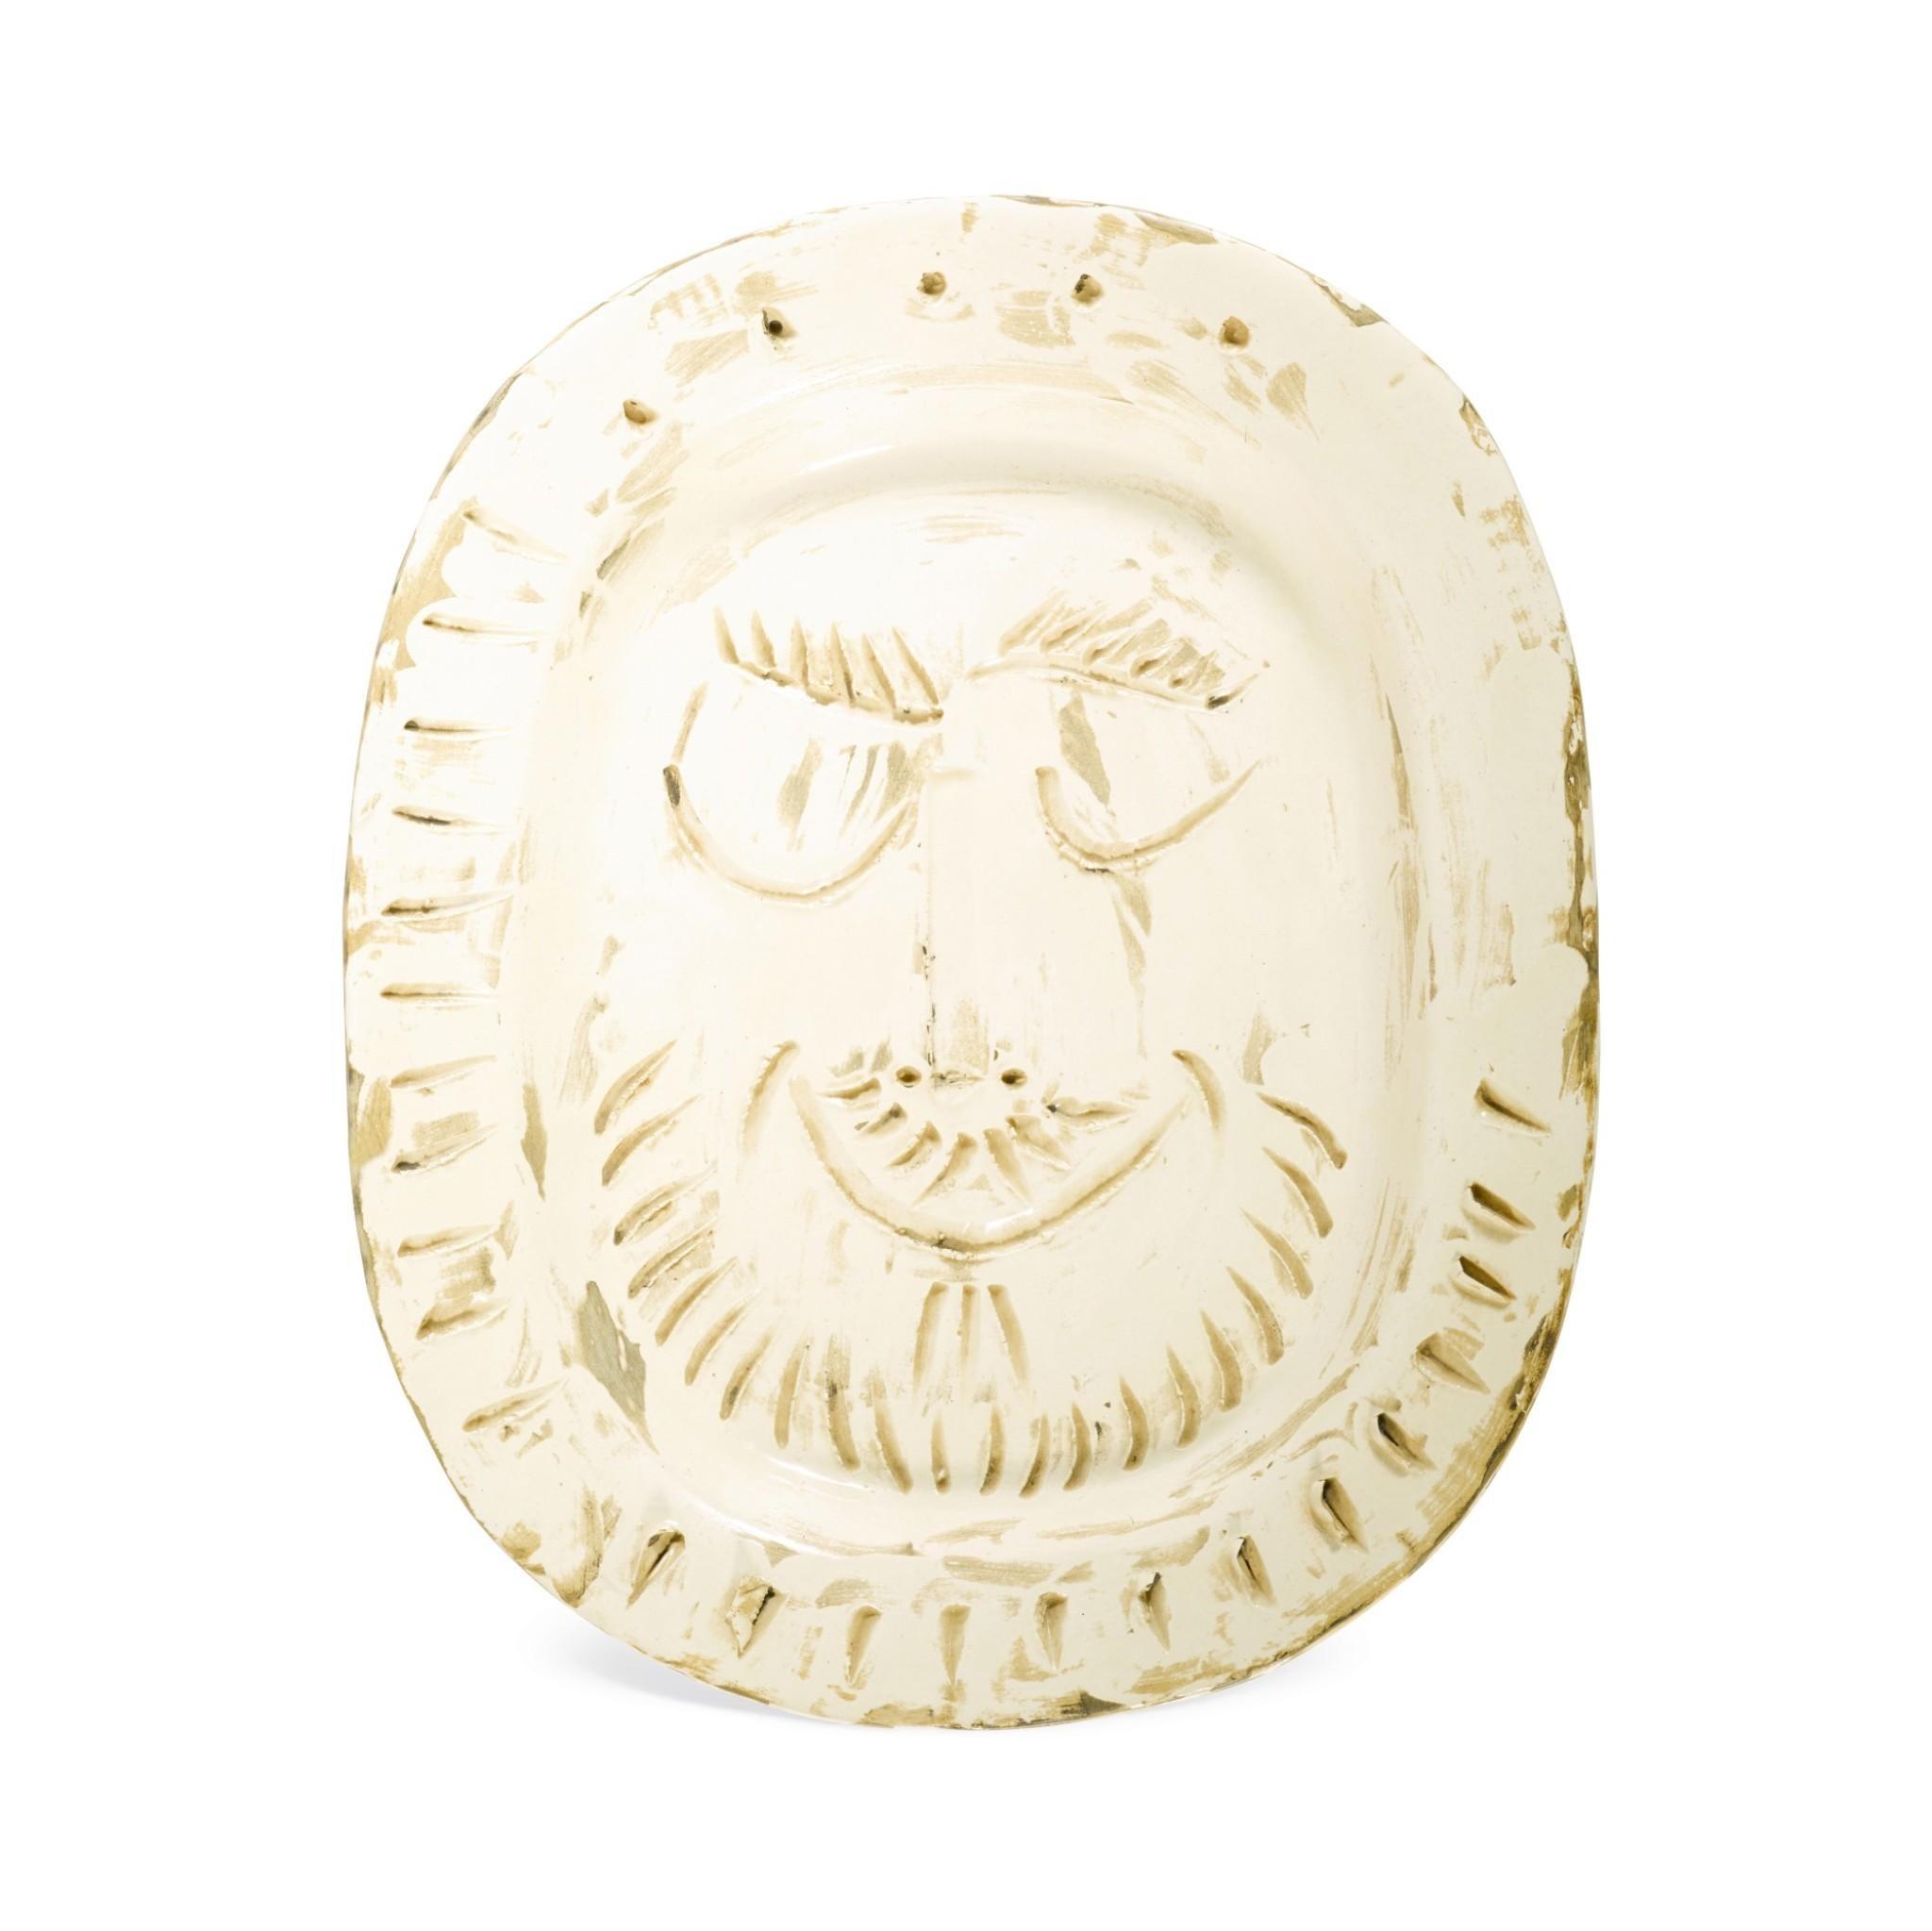 Madoura Ceramic Plate- Visage d'Homme, Ramié 287